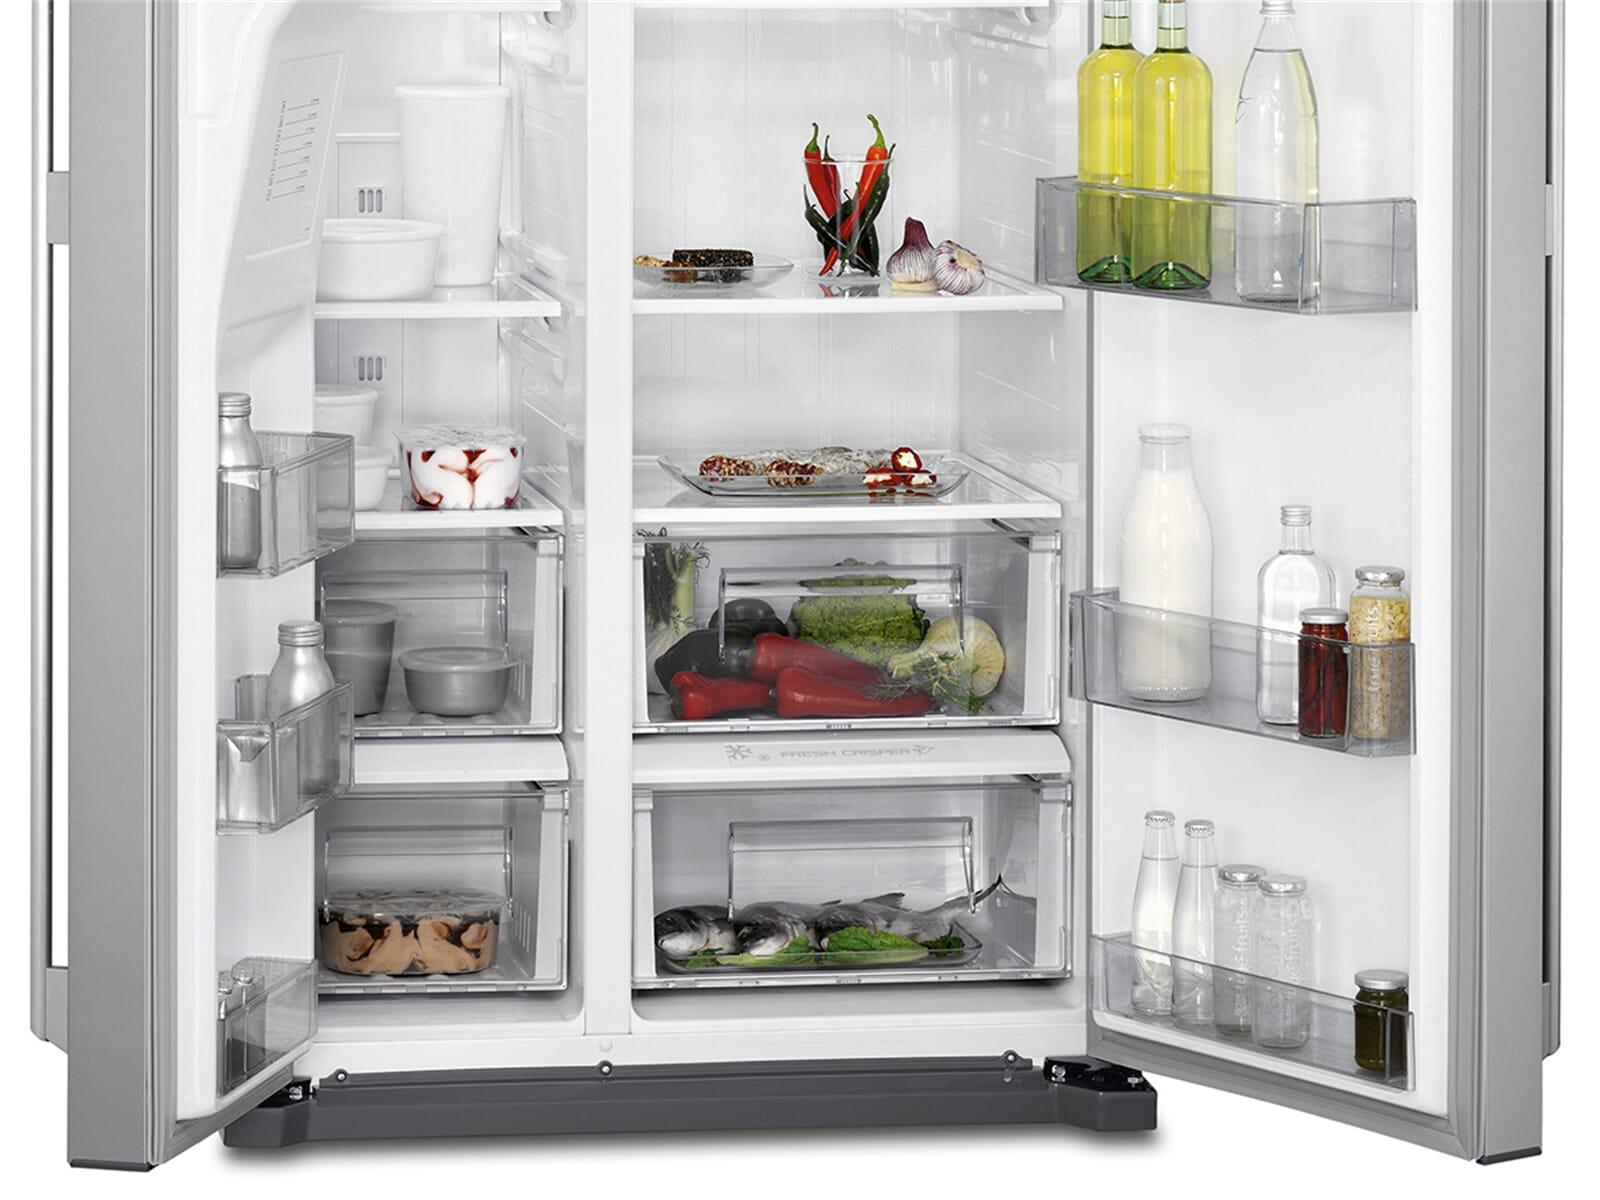 Aeg Kühlschrank Rkb64024dx : Aeg unterbau kühlschrank edelstahl aeg kühlschrank kaufen zum